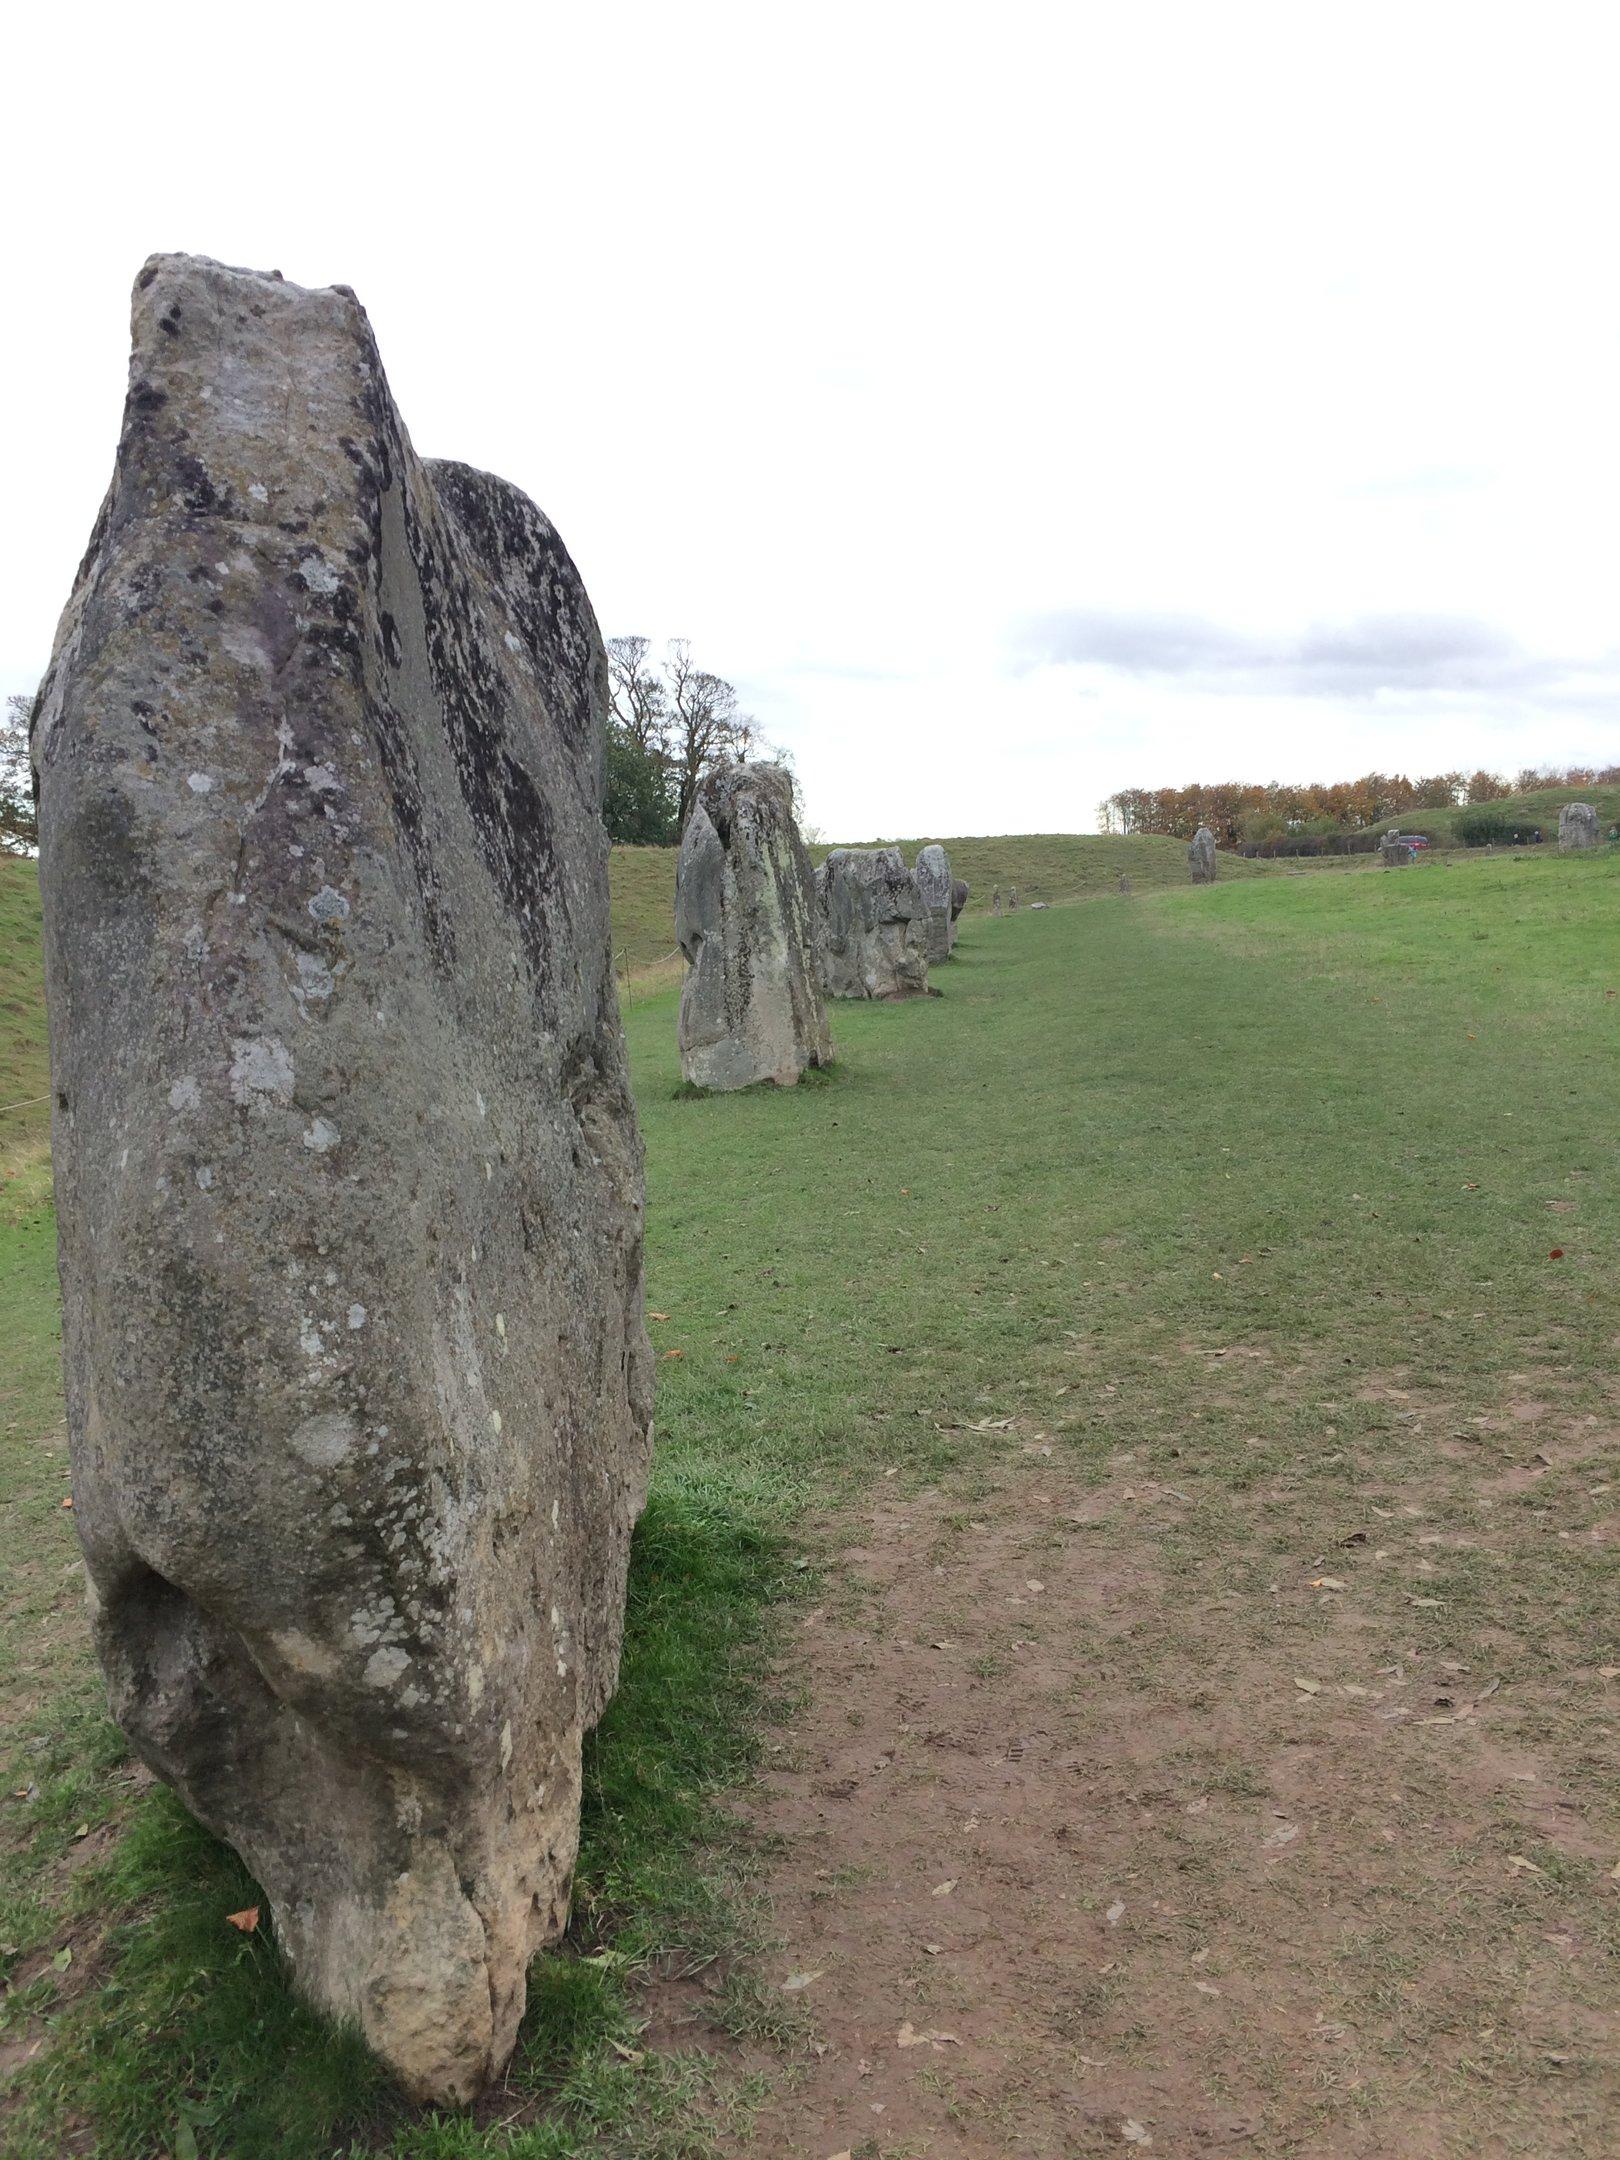 img_4151-jpg.53670_Stonehenge & Avebury stone circle_Travel Stories_Squat the Planet_4:42 PM